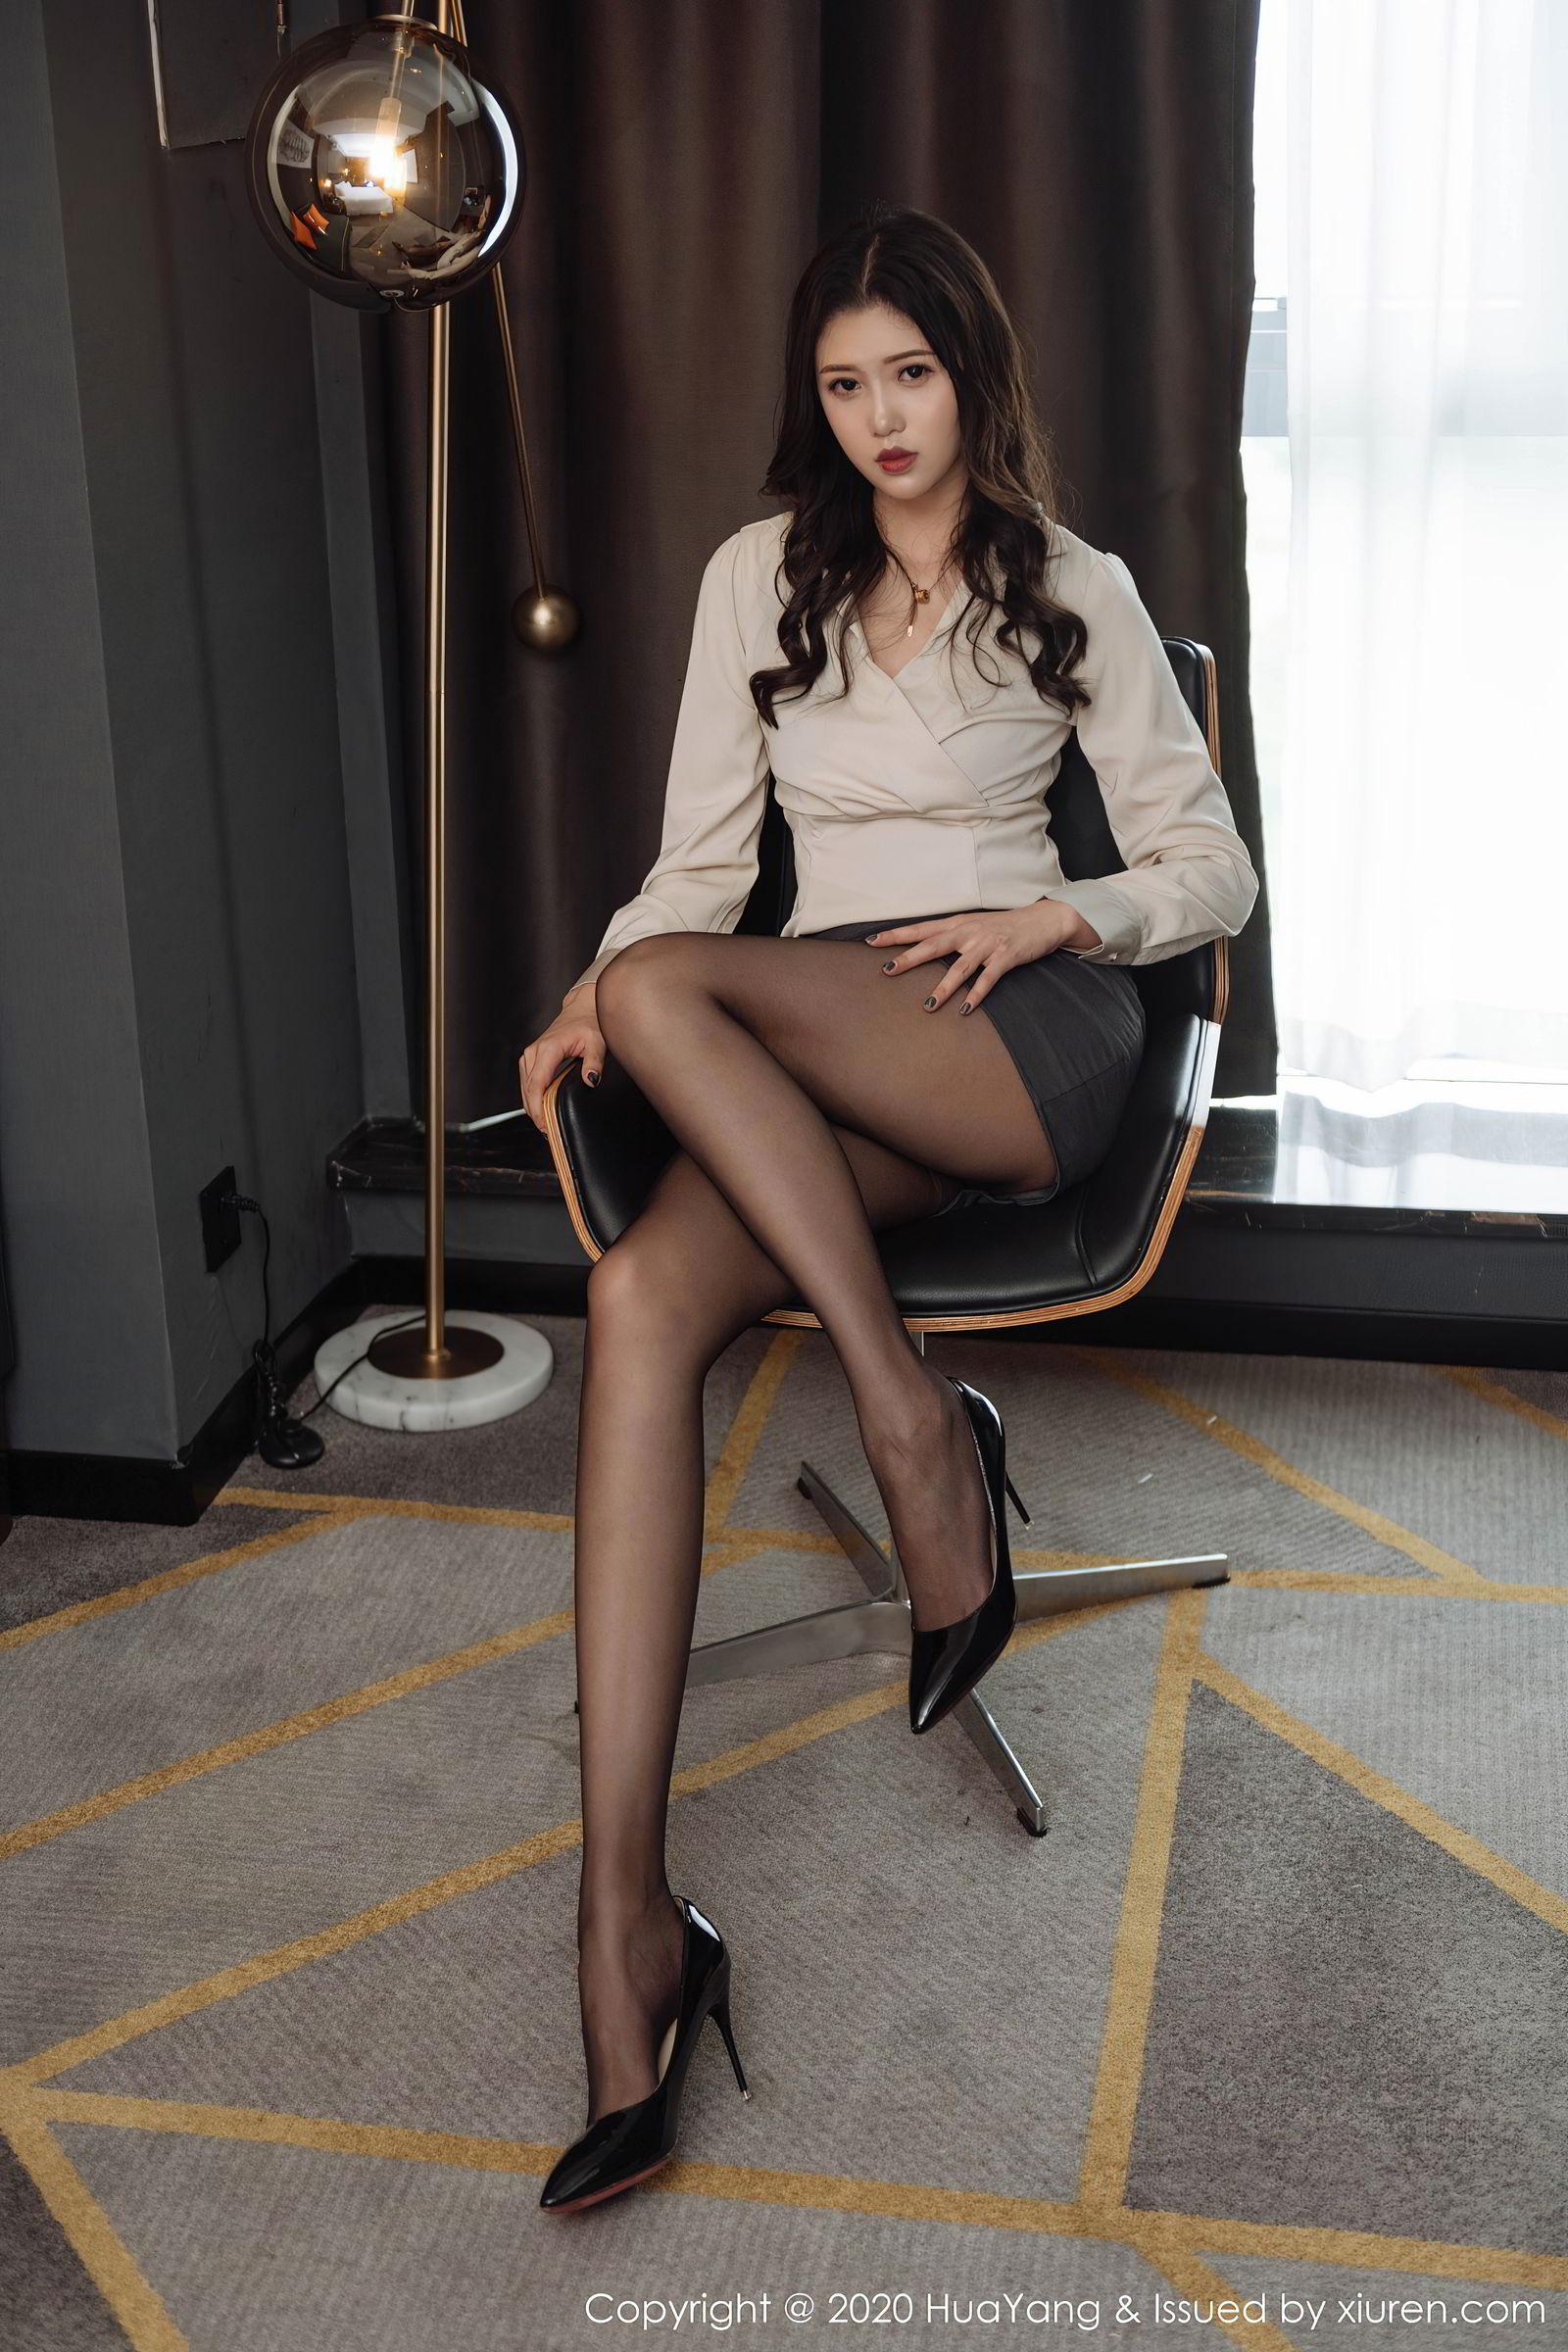 Vol.540 都市丽人丝袜美腿职场OL高跟鞋美女模特花漾写真-陈一涵完整私房照合集